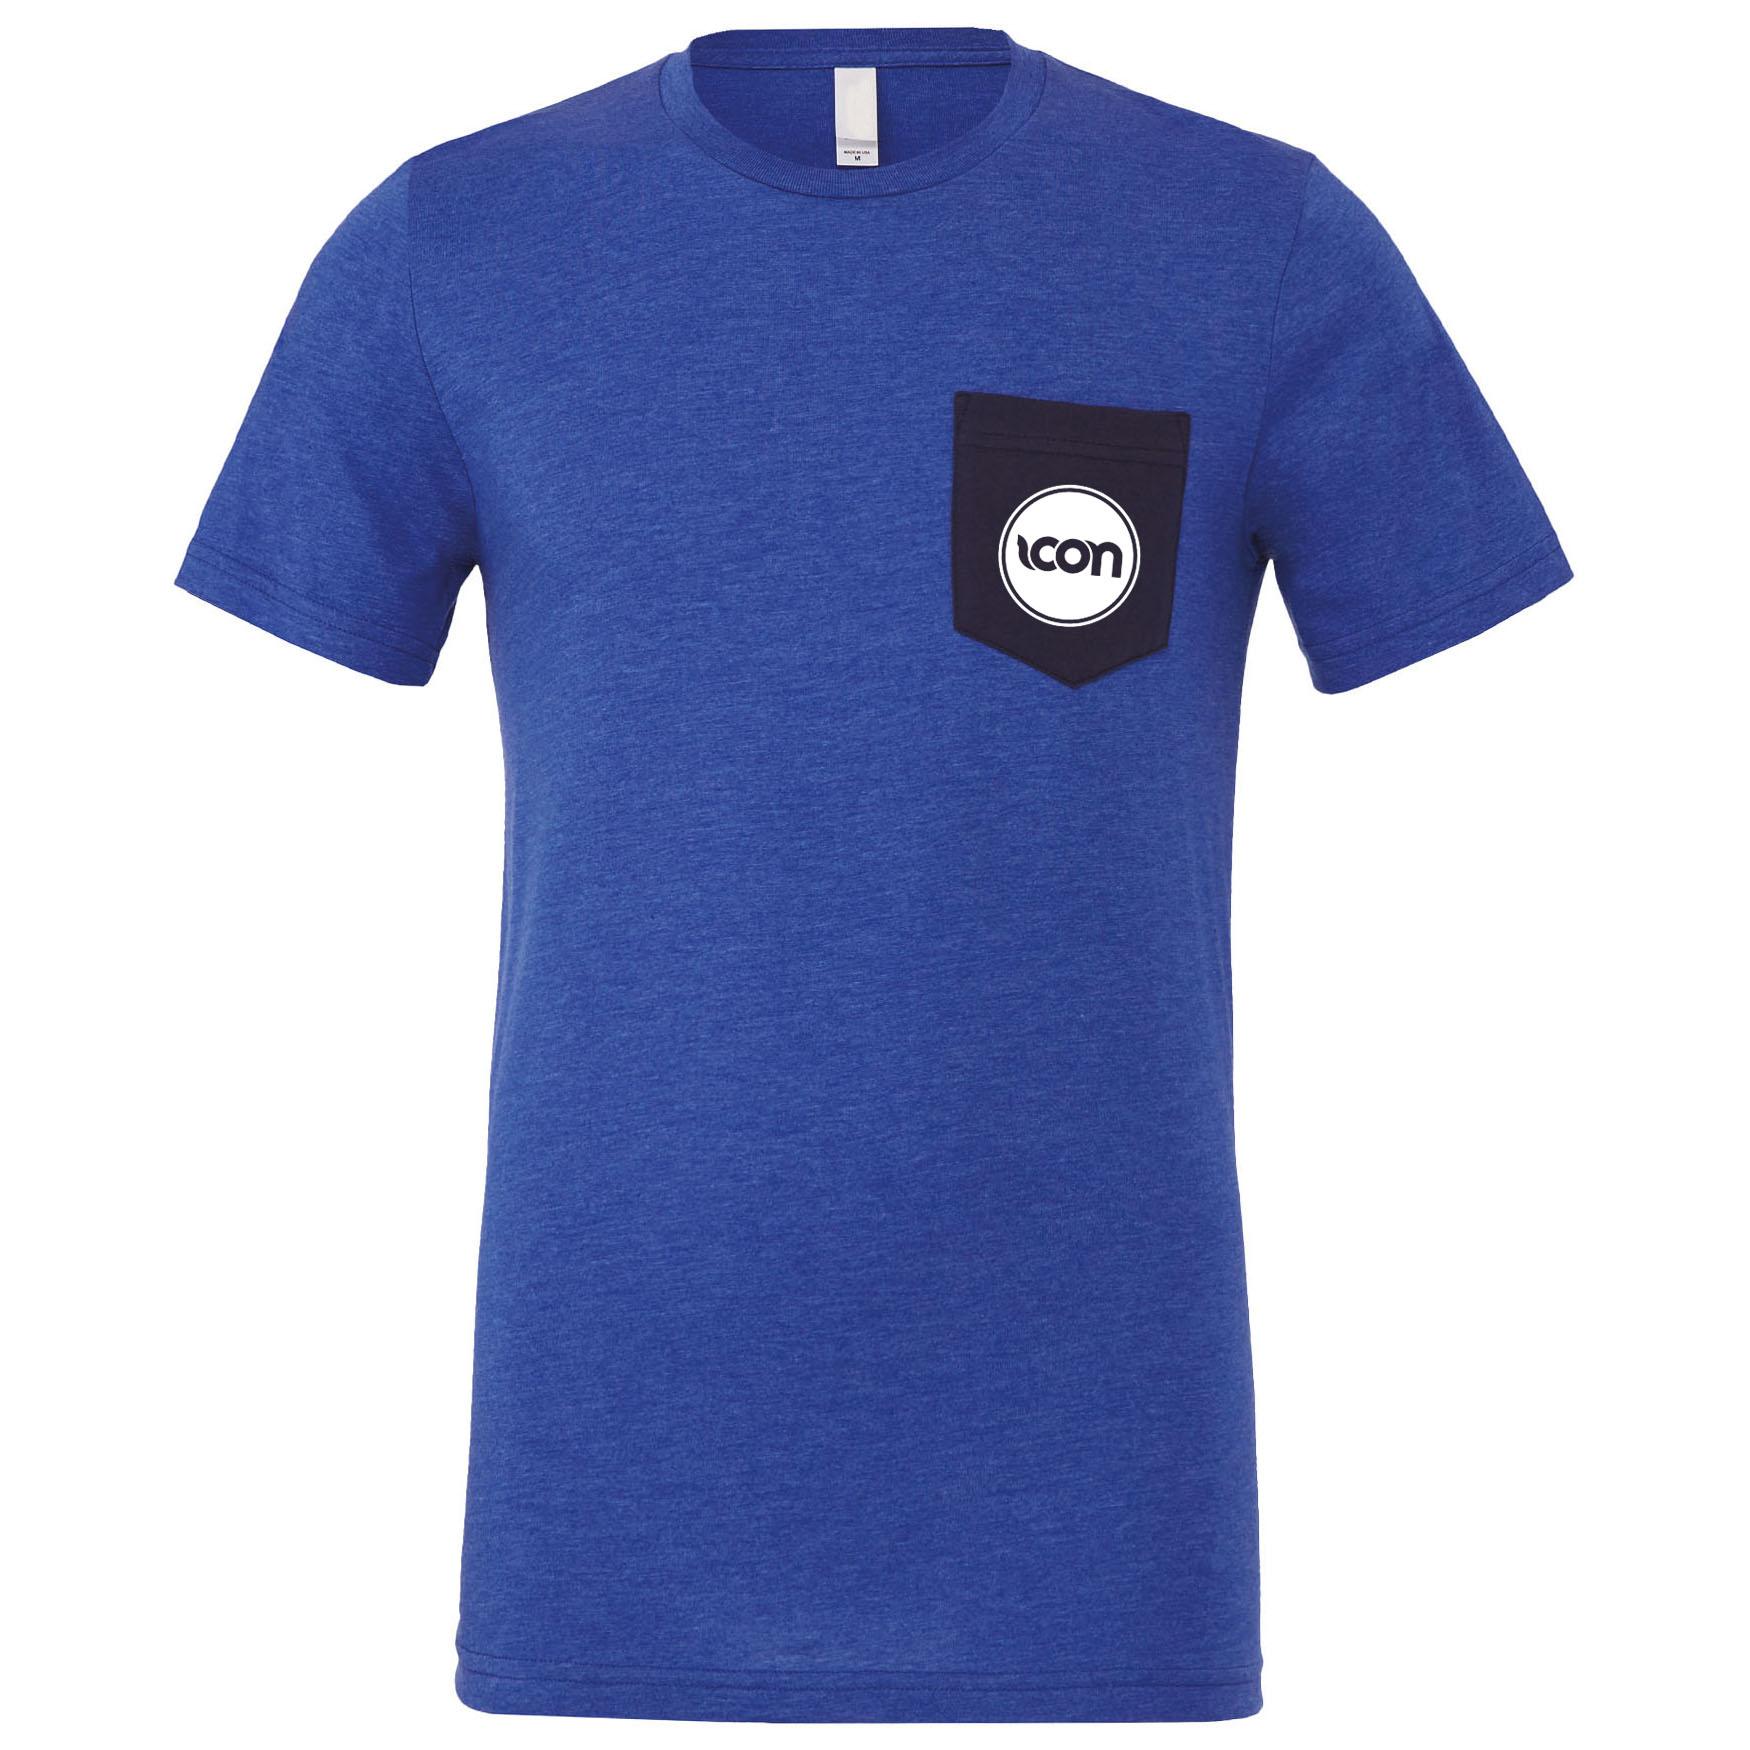 icon bike store - T-shirt Pocket Icon